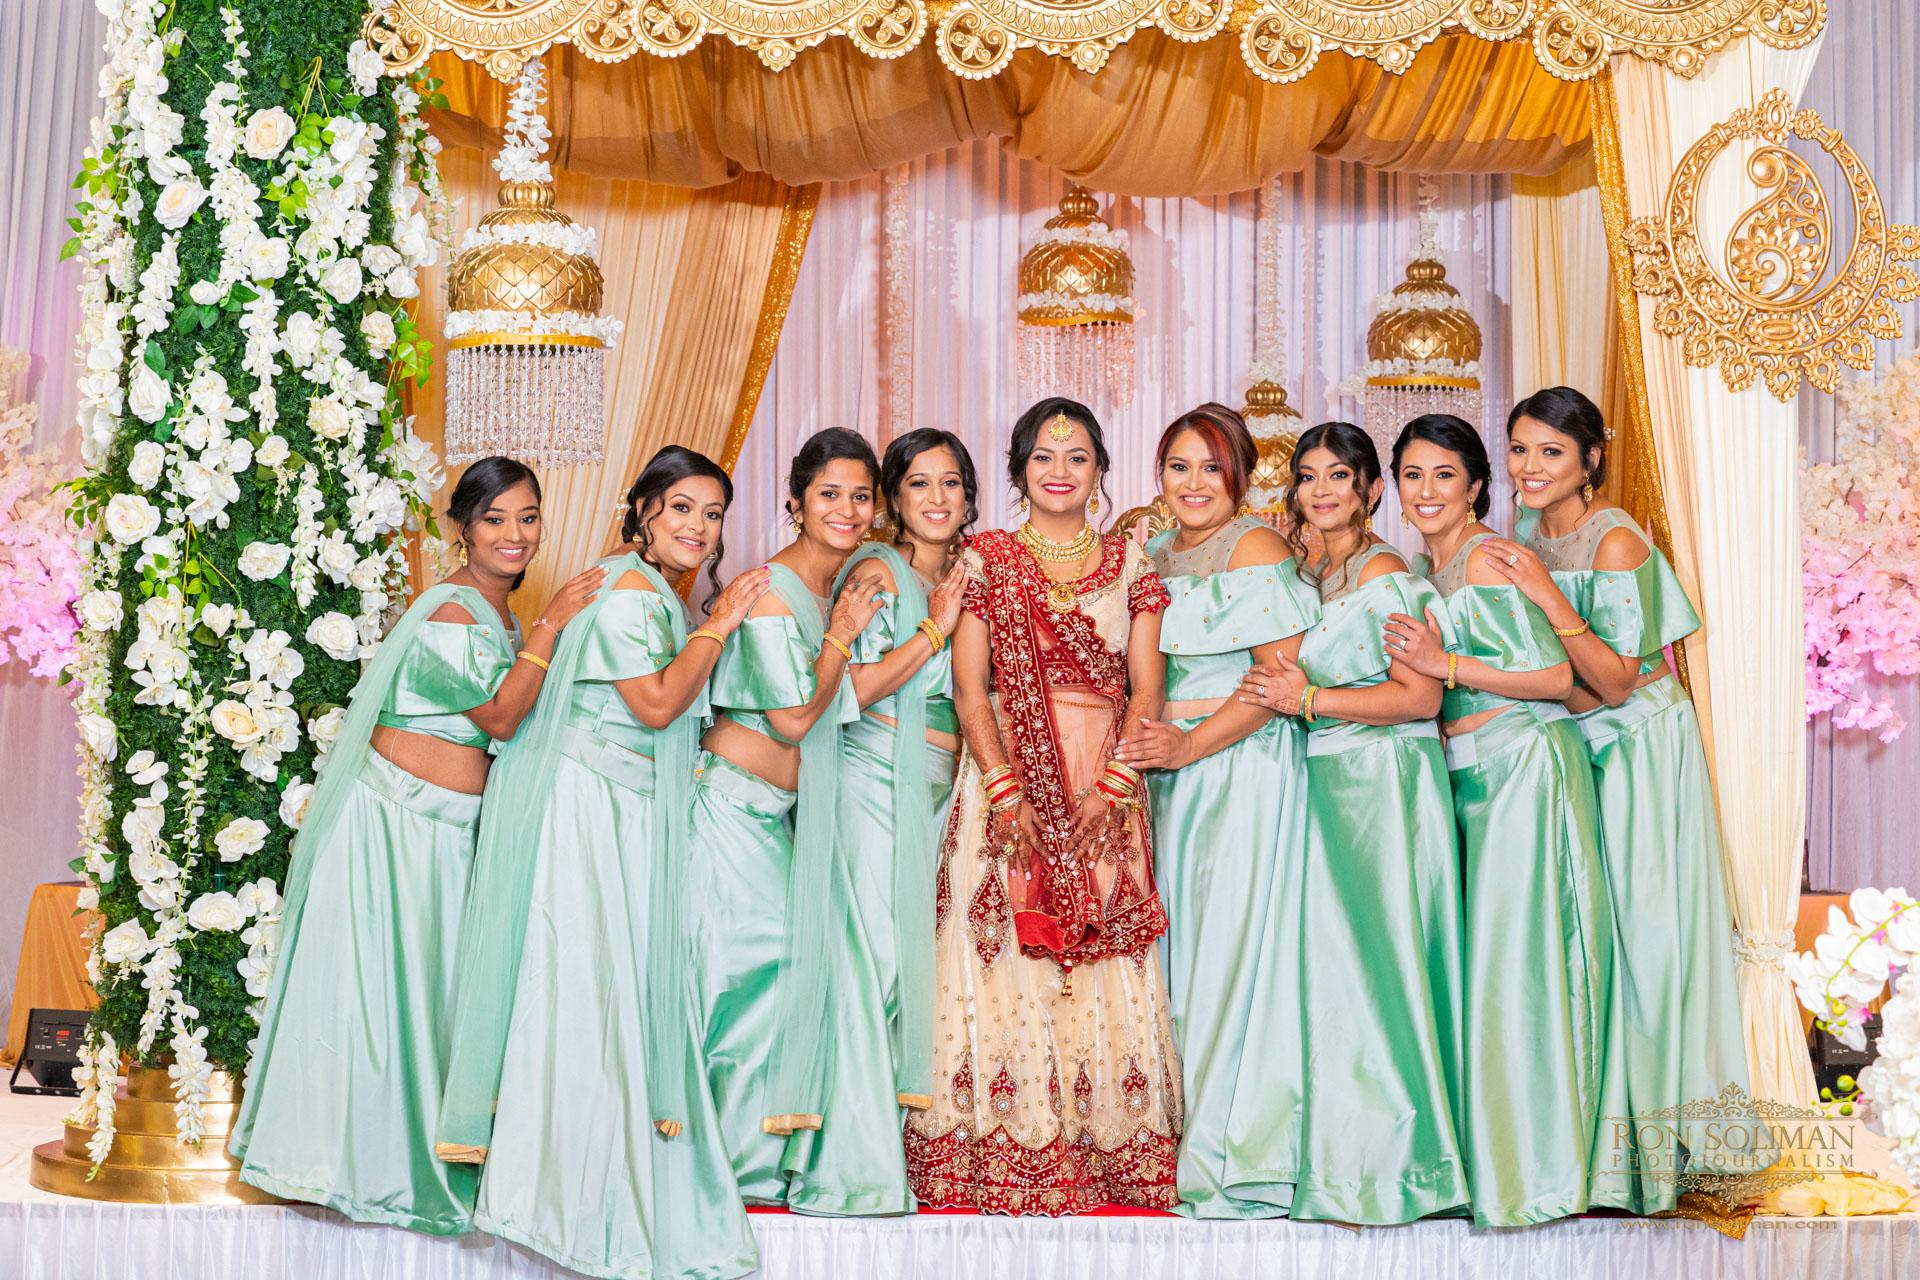 HILTON PARSIPANNY INDIAN WEDDING 8